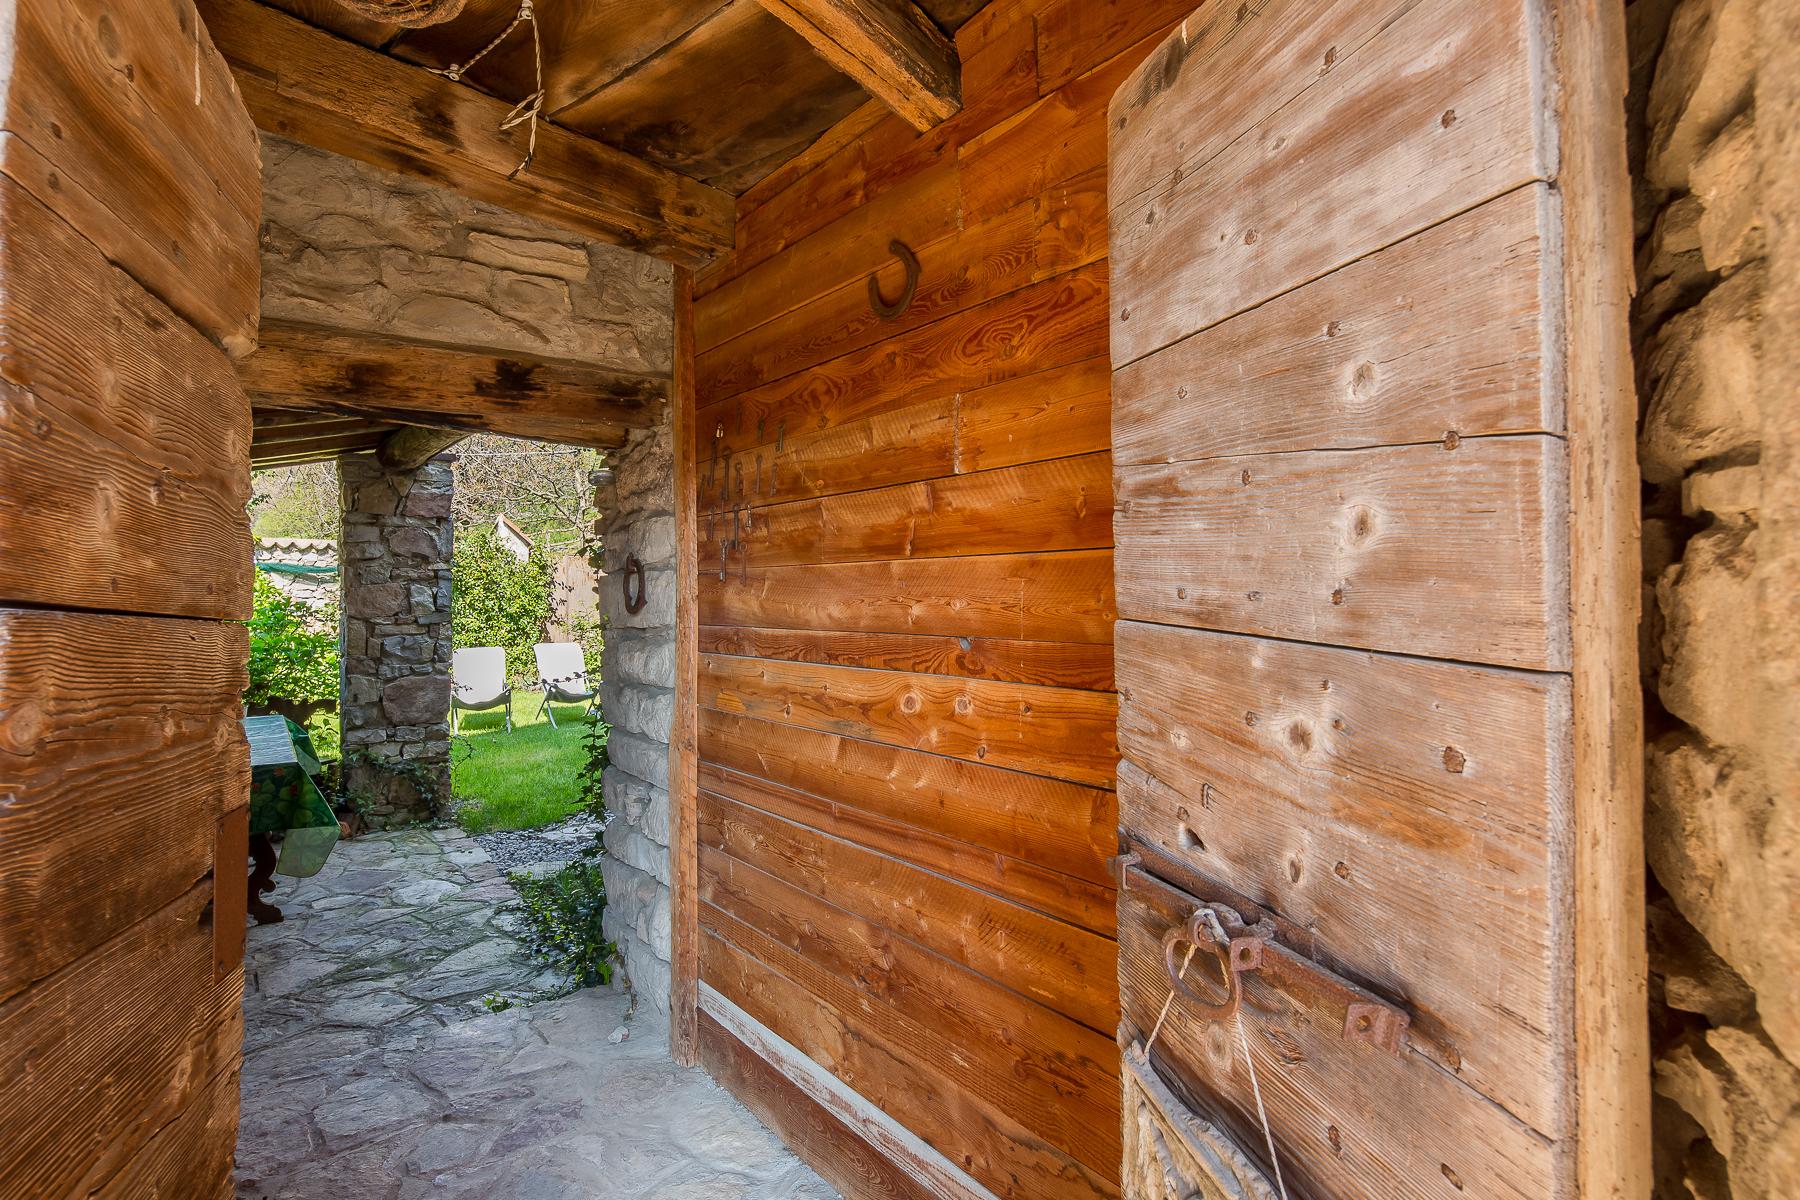 Casa indipendente in Vendita a Caprino Bergamasco: 5 locali, 500 mq - Foto 12